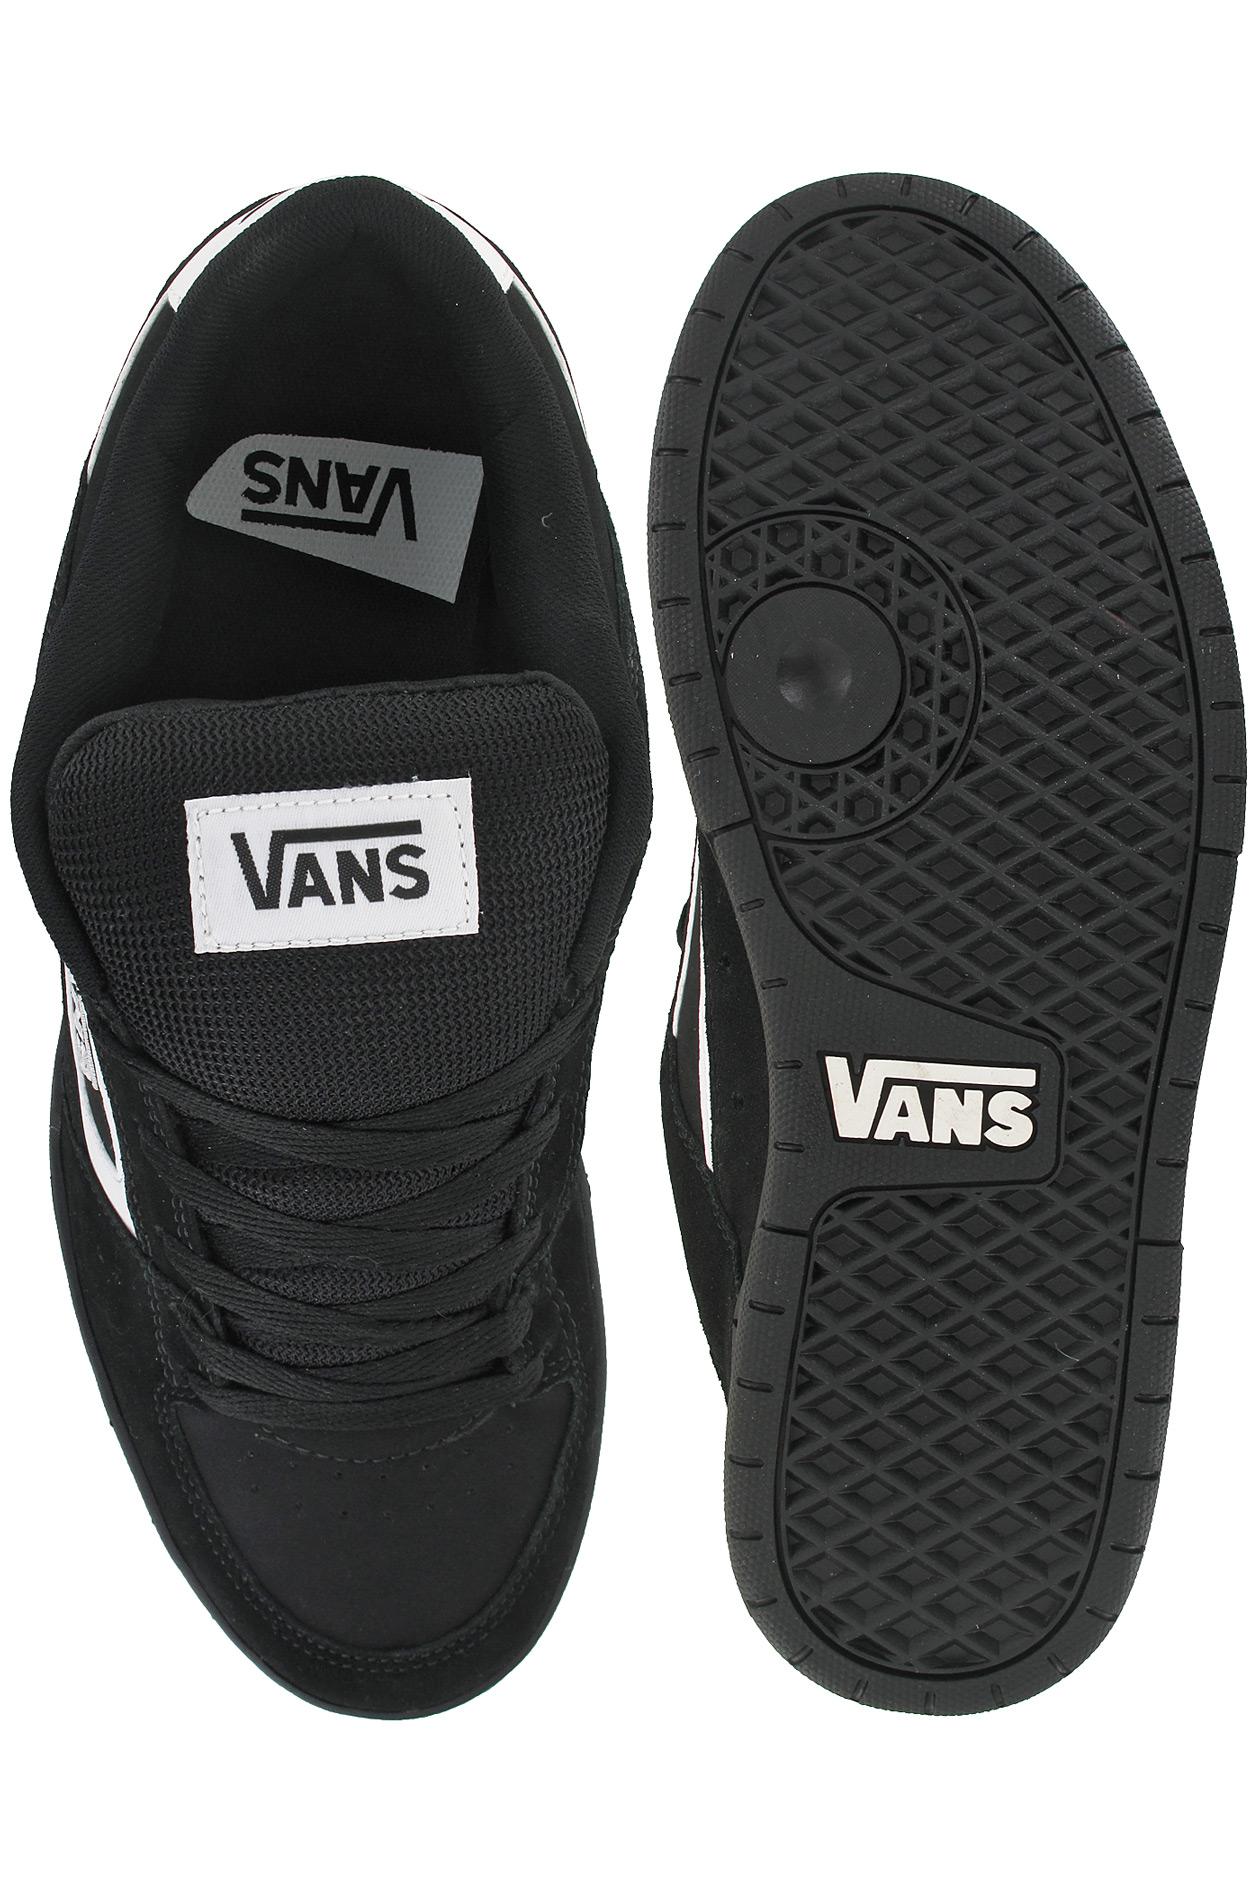 Vans Churchill Shoes